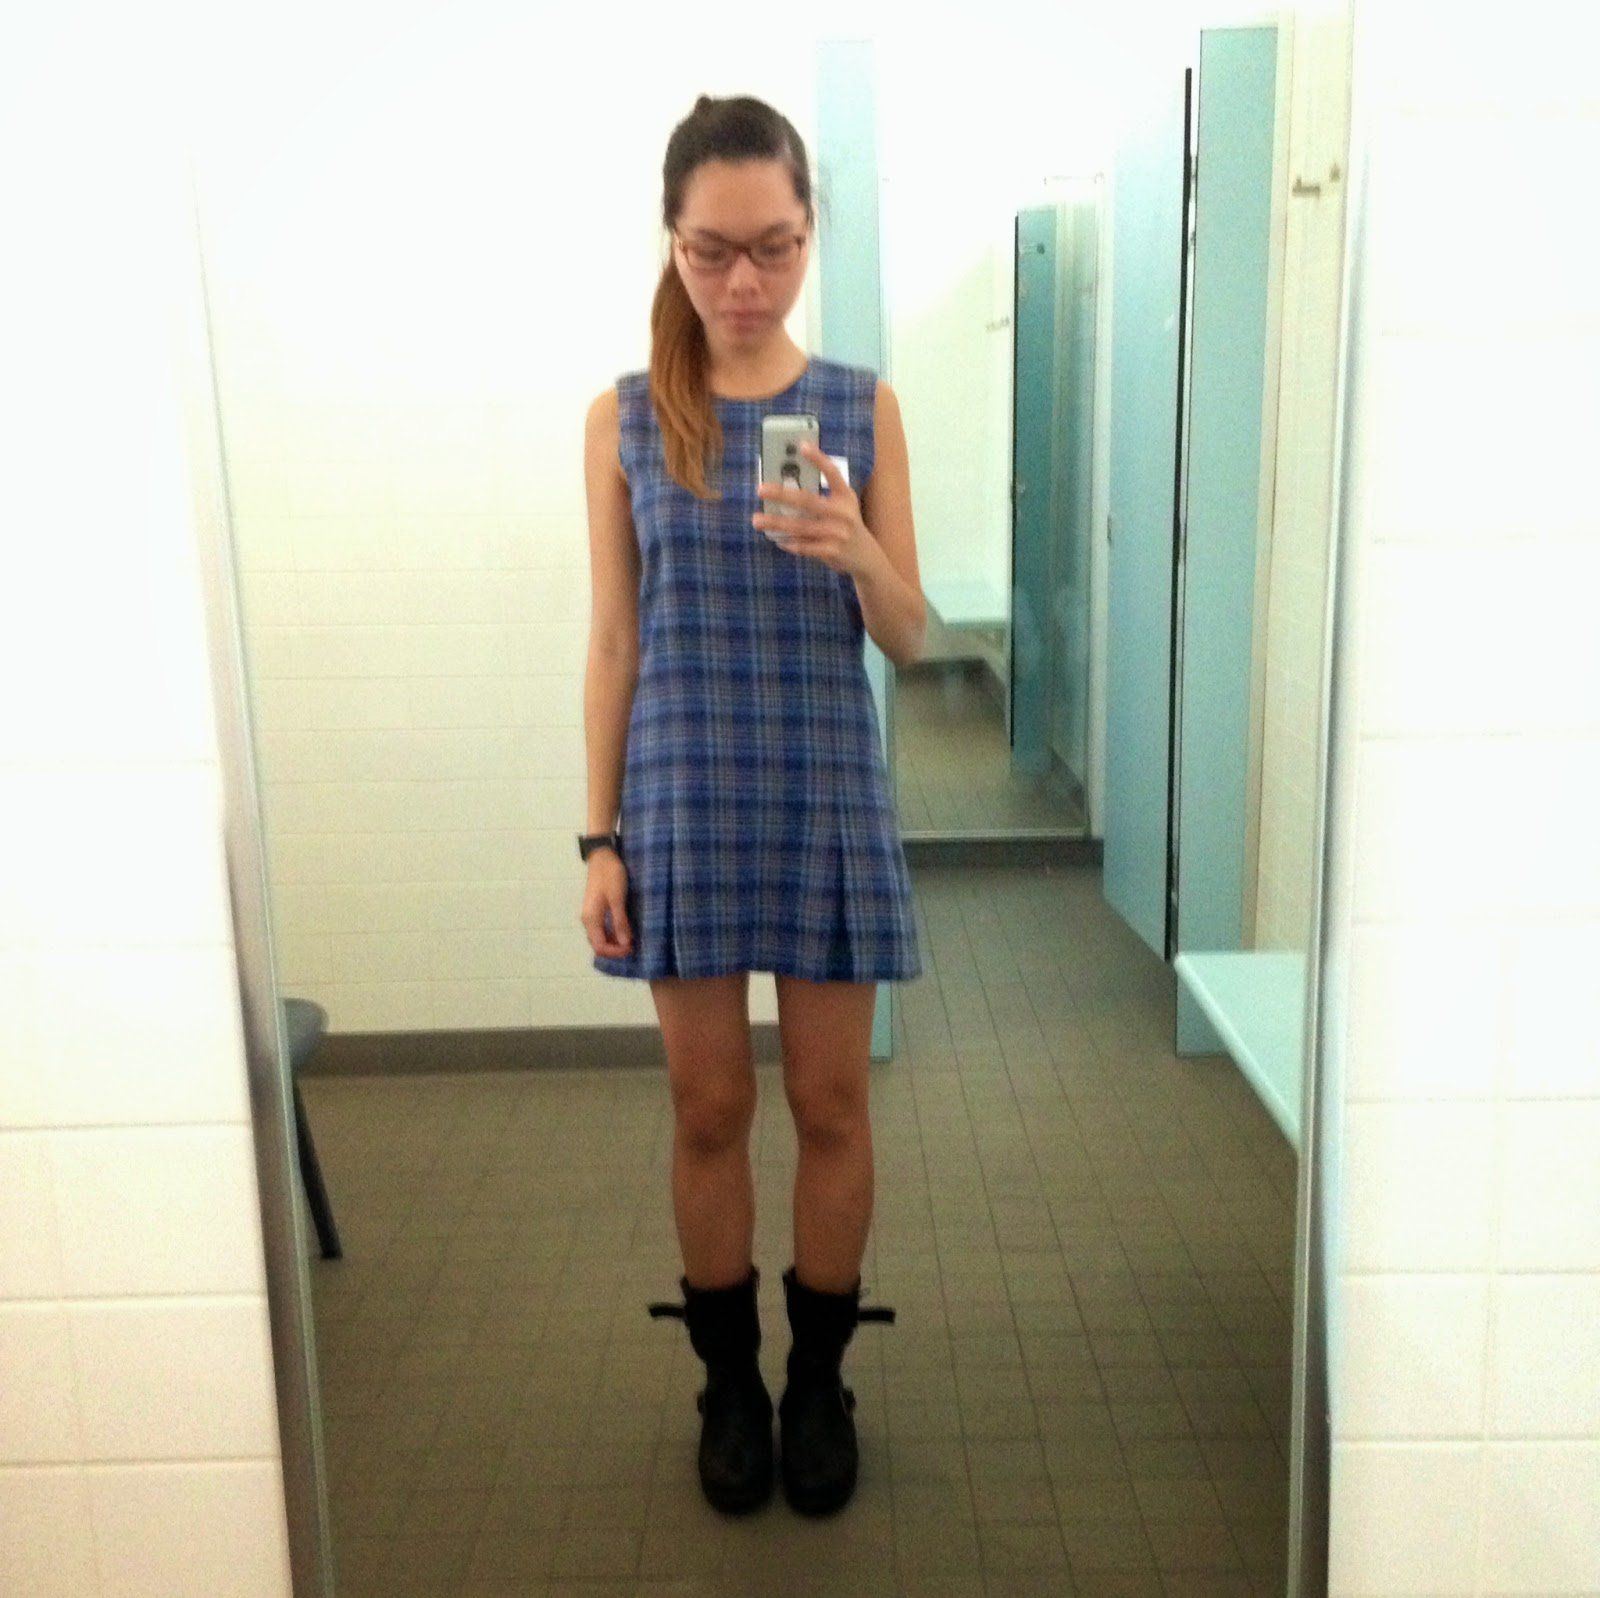 Nude nerdy girl gifs